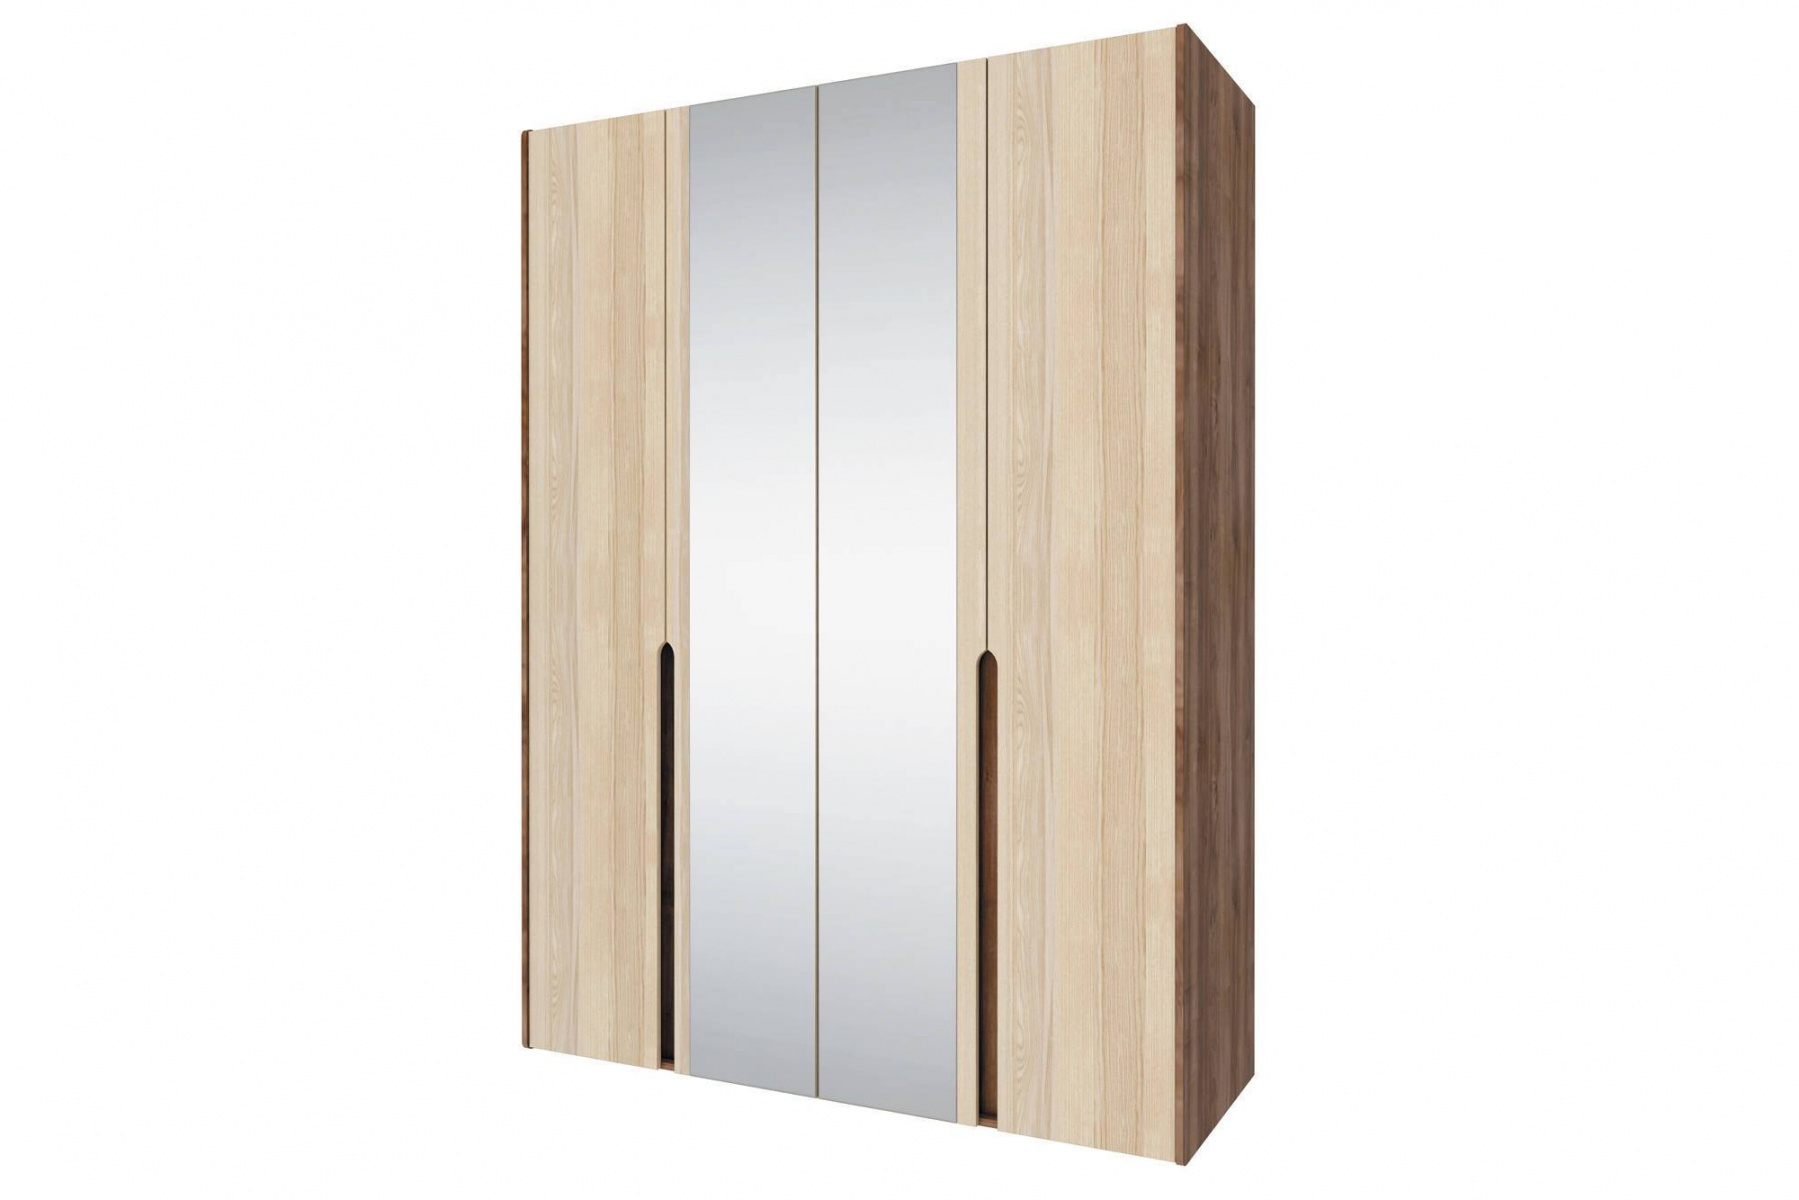 Шкаф 4-х дверный с зеркалом Ребекка СТЛ.186.01 ребекка блум